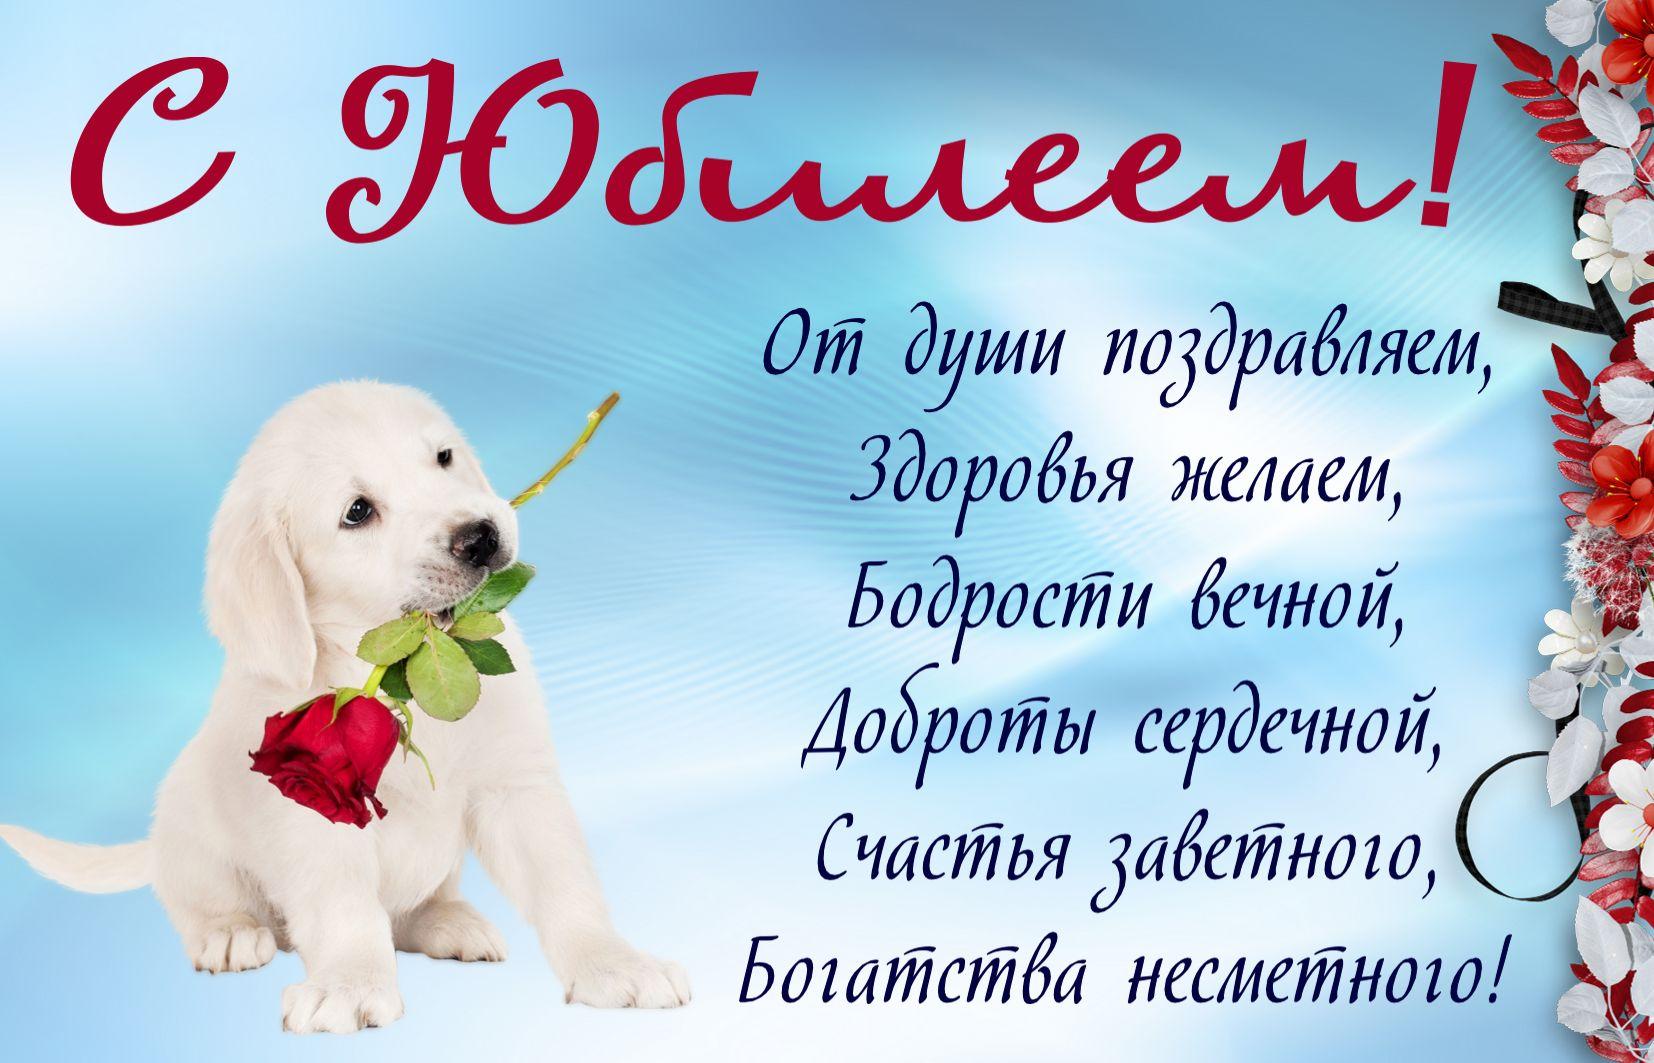 Открытка к юбилею - собачка с розой и пожелание